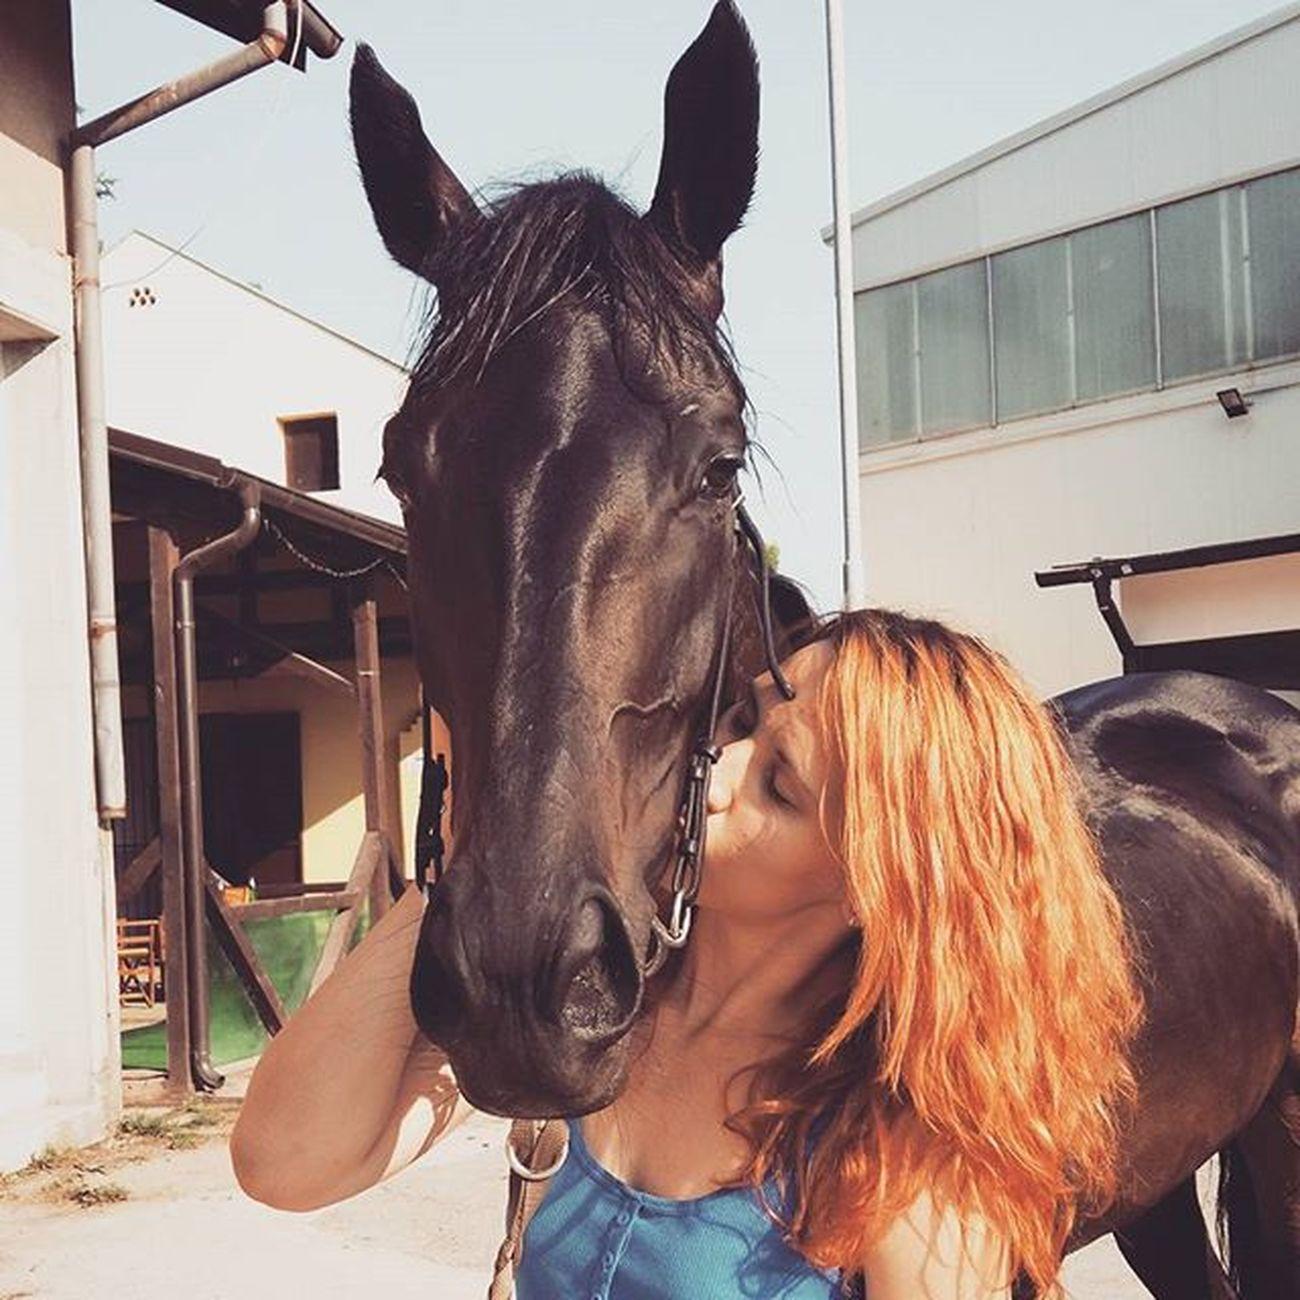 Kobilaca iz snova postoji! 🏇🏇🏇🏇❤❤❤❤❤💖💖💖💖👌👌👌👌 Thoroughbredsofinstagram Horsesofinstagram Horse Love mare dreammare caballosdeinstagram